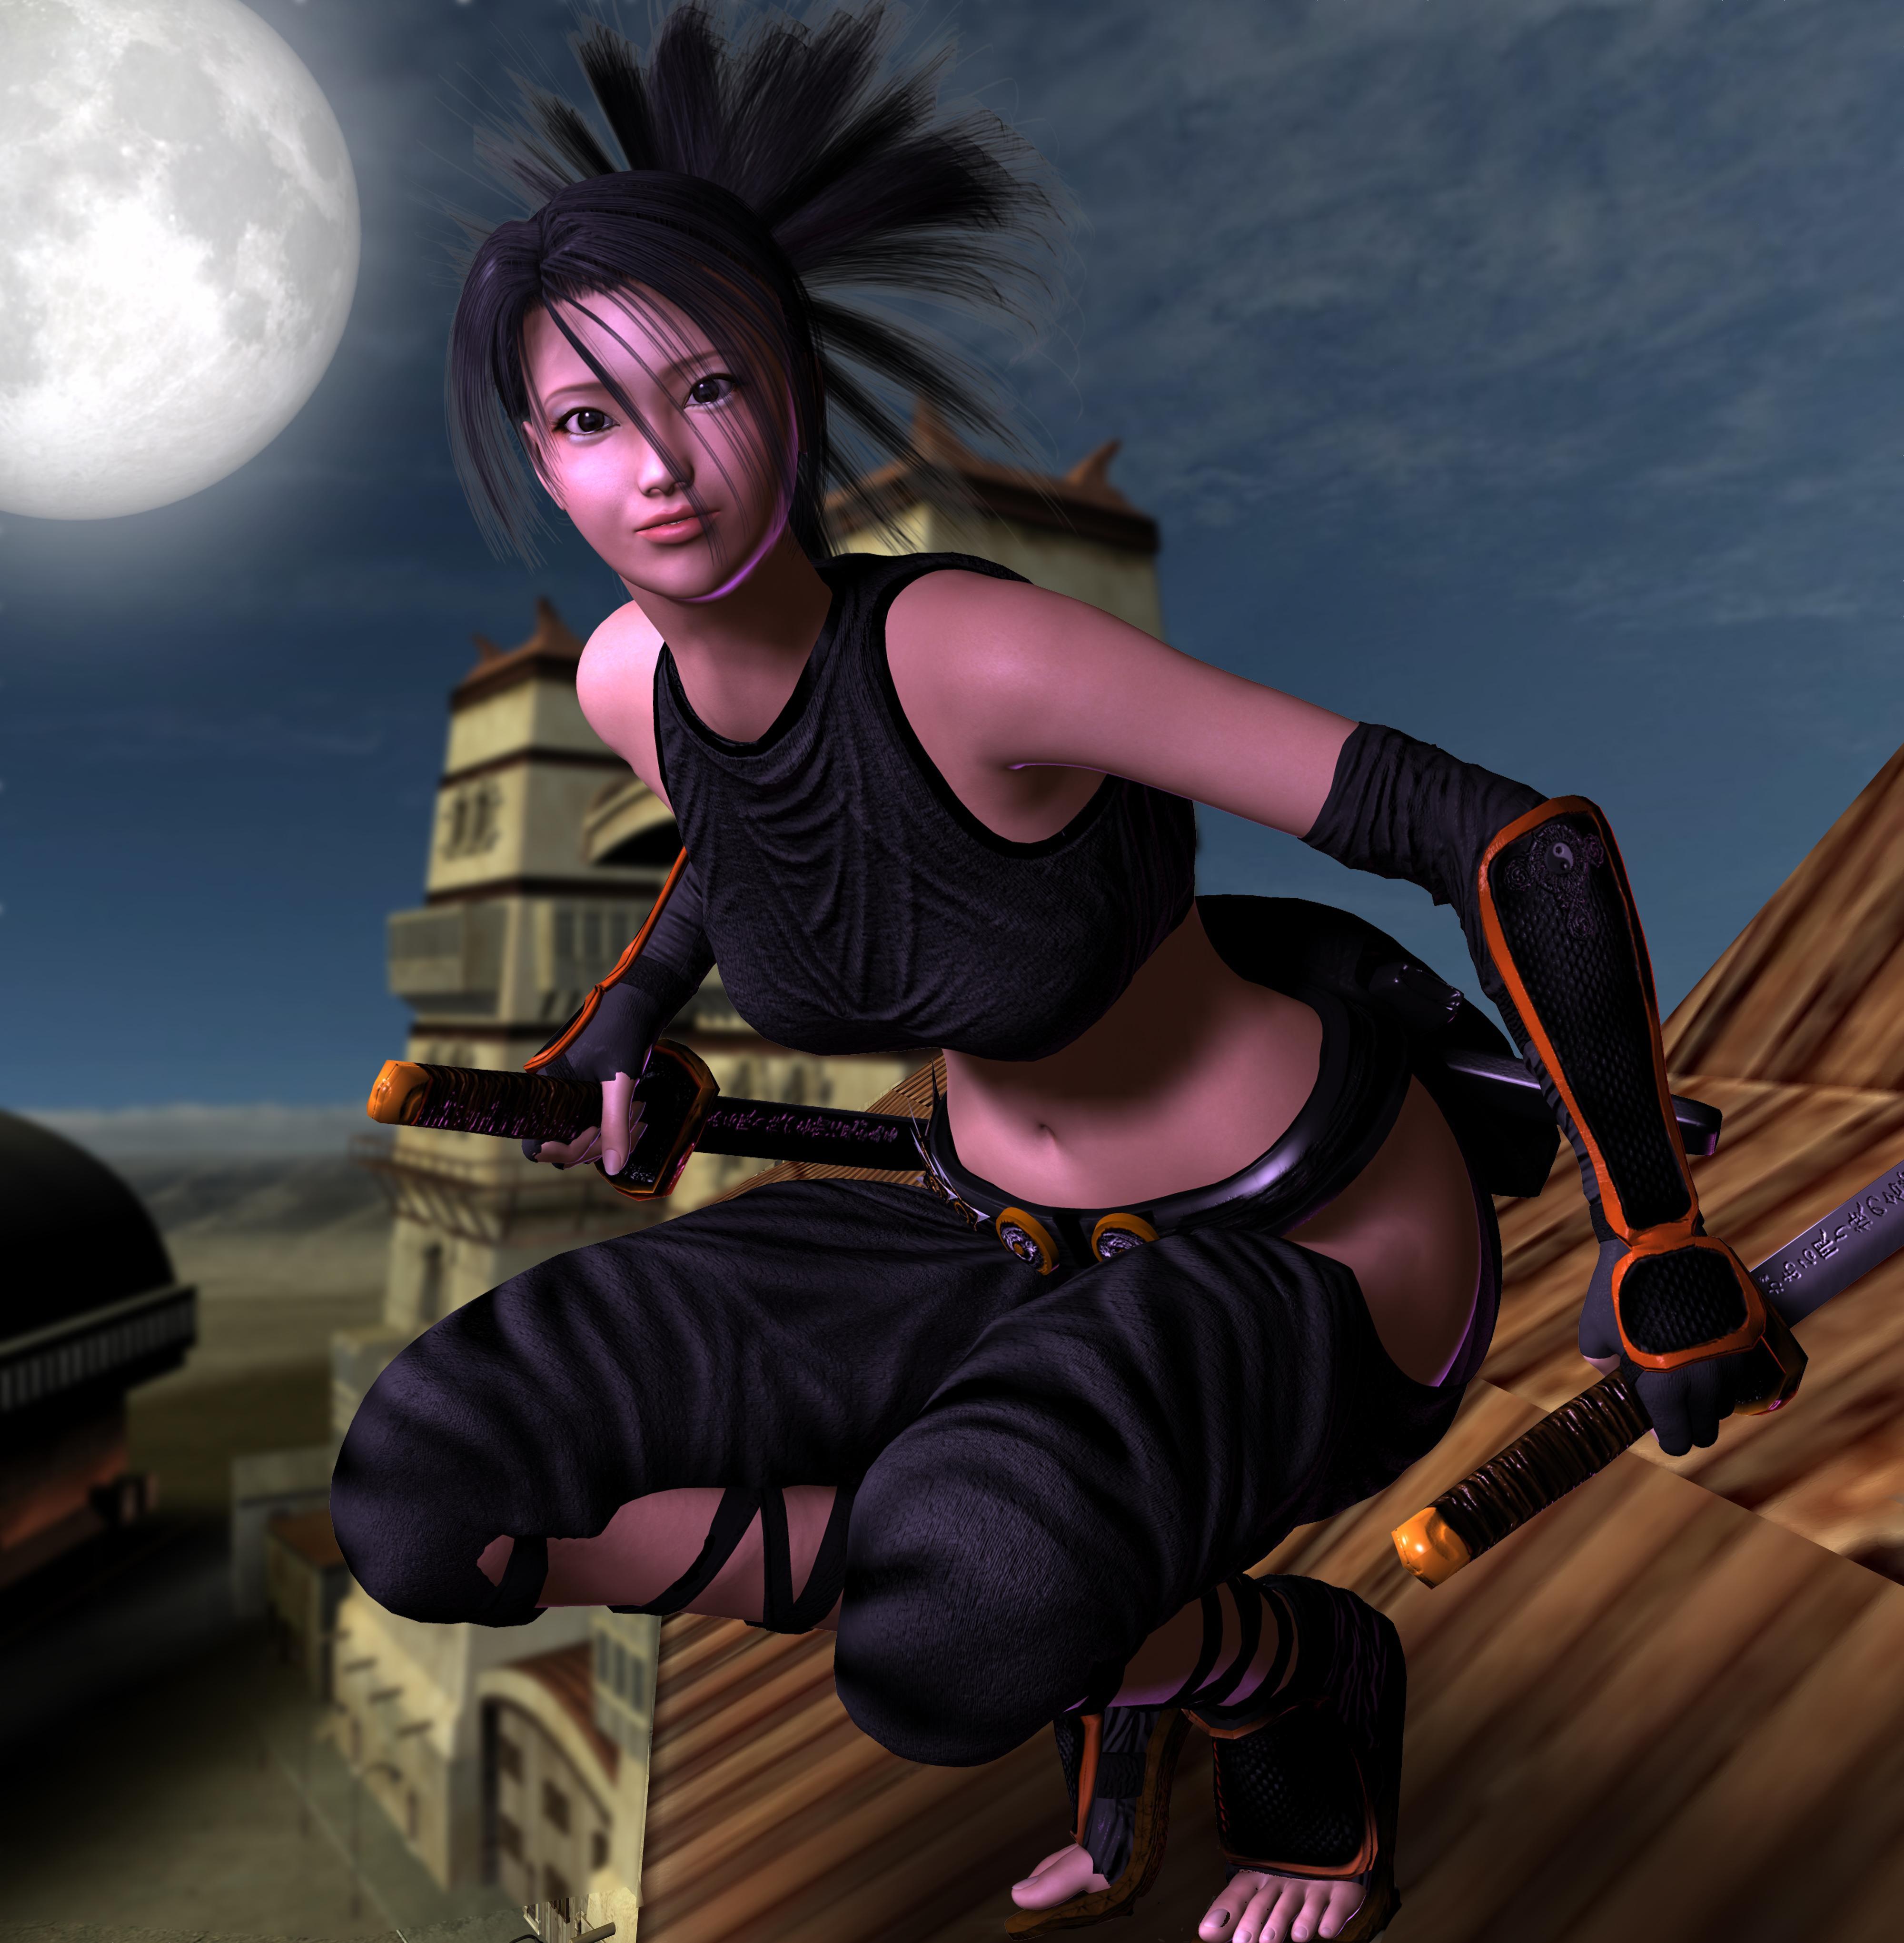 Tenchu Ayame Moonlight Ninja By Jules2626 On Deviantart